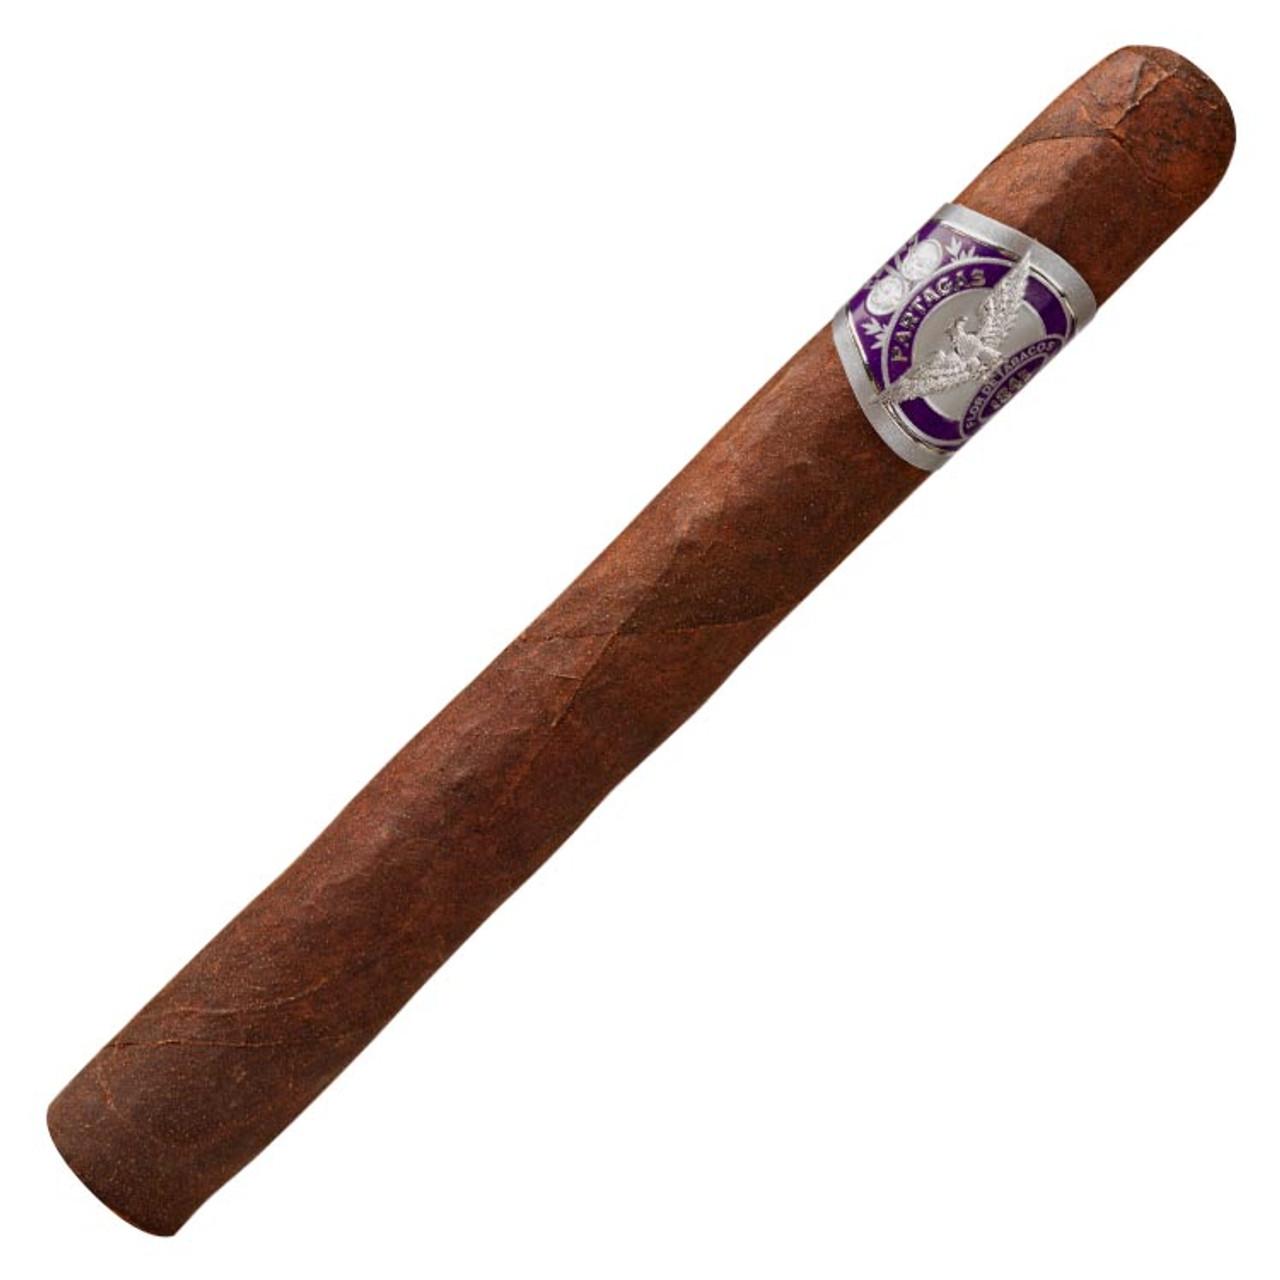 Partagas 1845 Extra Oscuro Churchill Cigars - 7.25 x 54 (Box of 20)